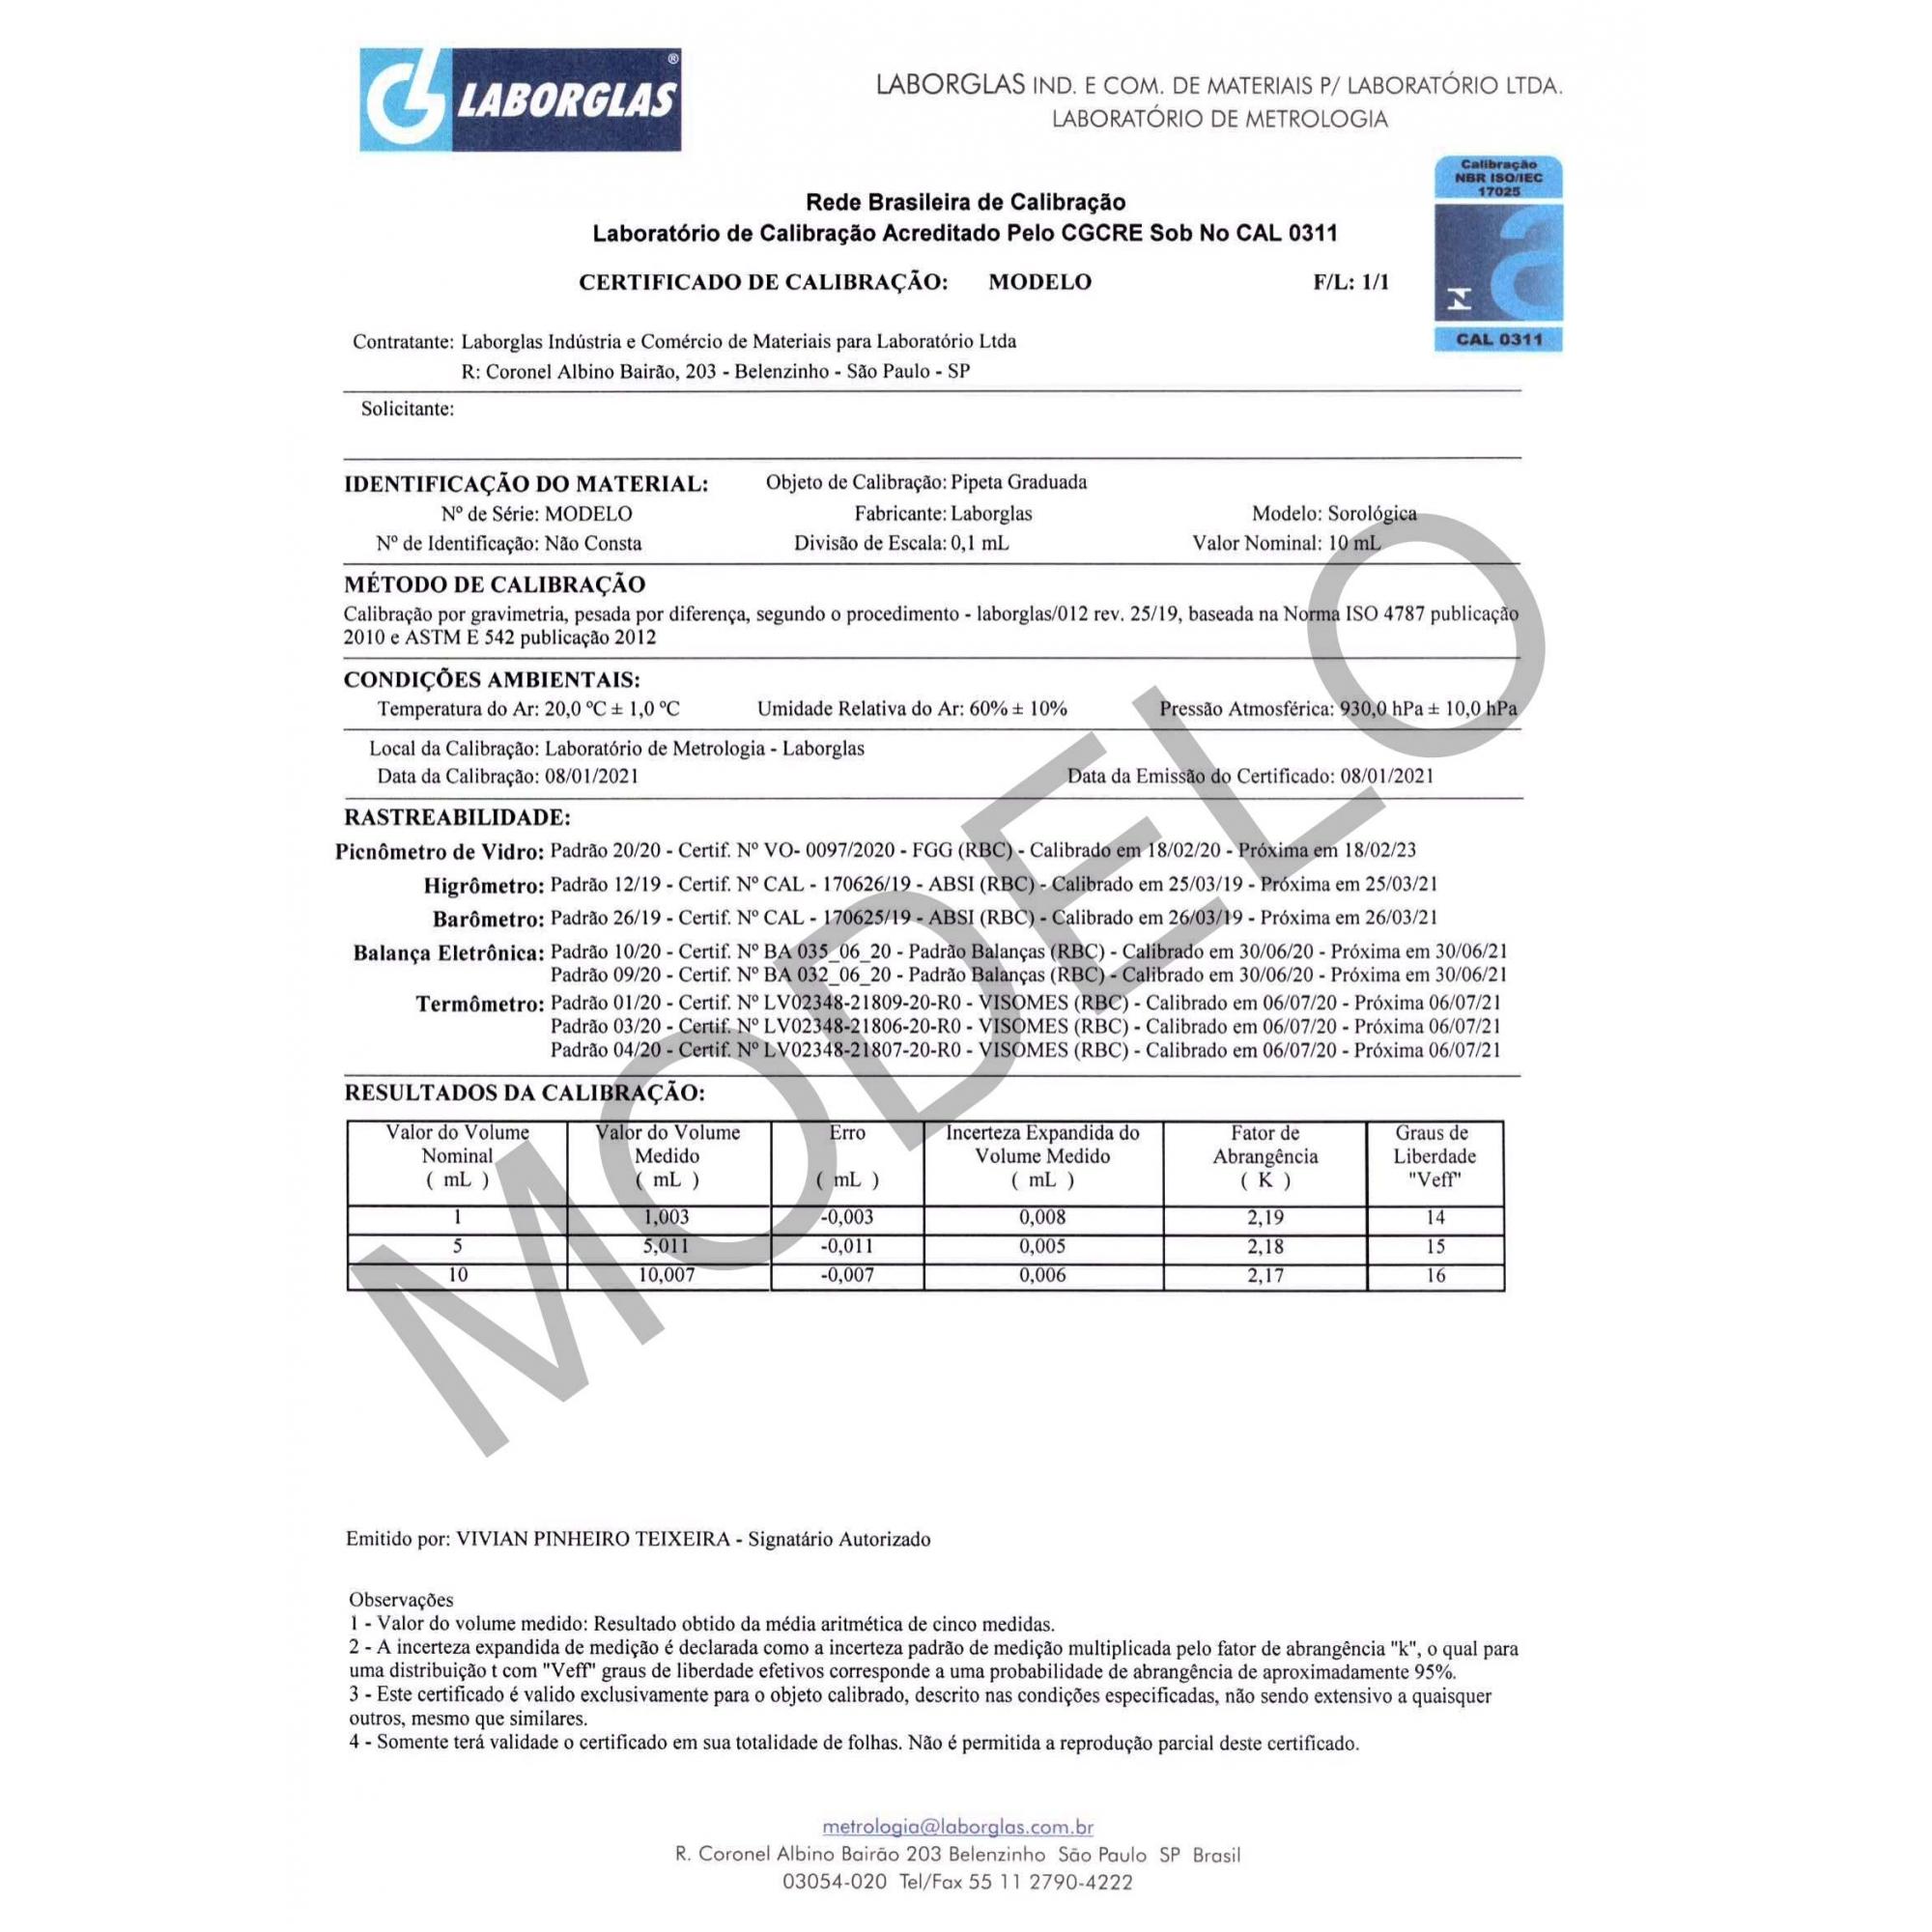 PIPETA GRADUADA SOROLÓGICA ESGOTOTAMENTO TOTAL 2 ML 1/10 CLASSE A COM CERTIFICADO RBC - Laborglas - Cód. 9443608-R